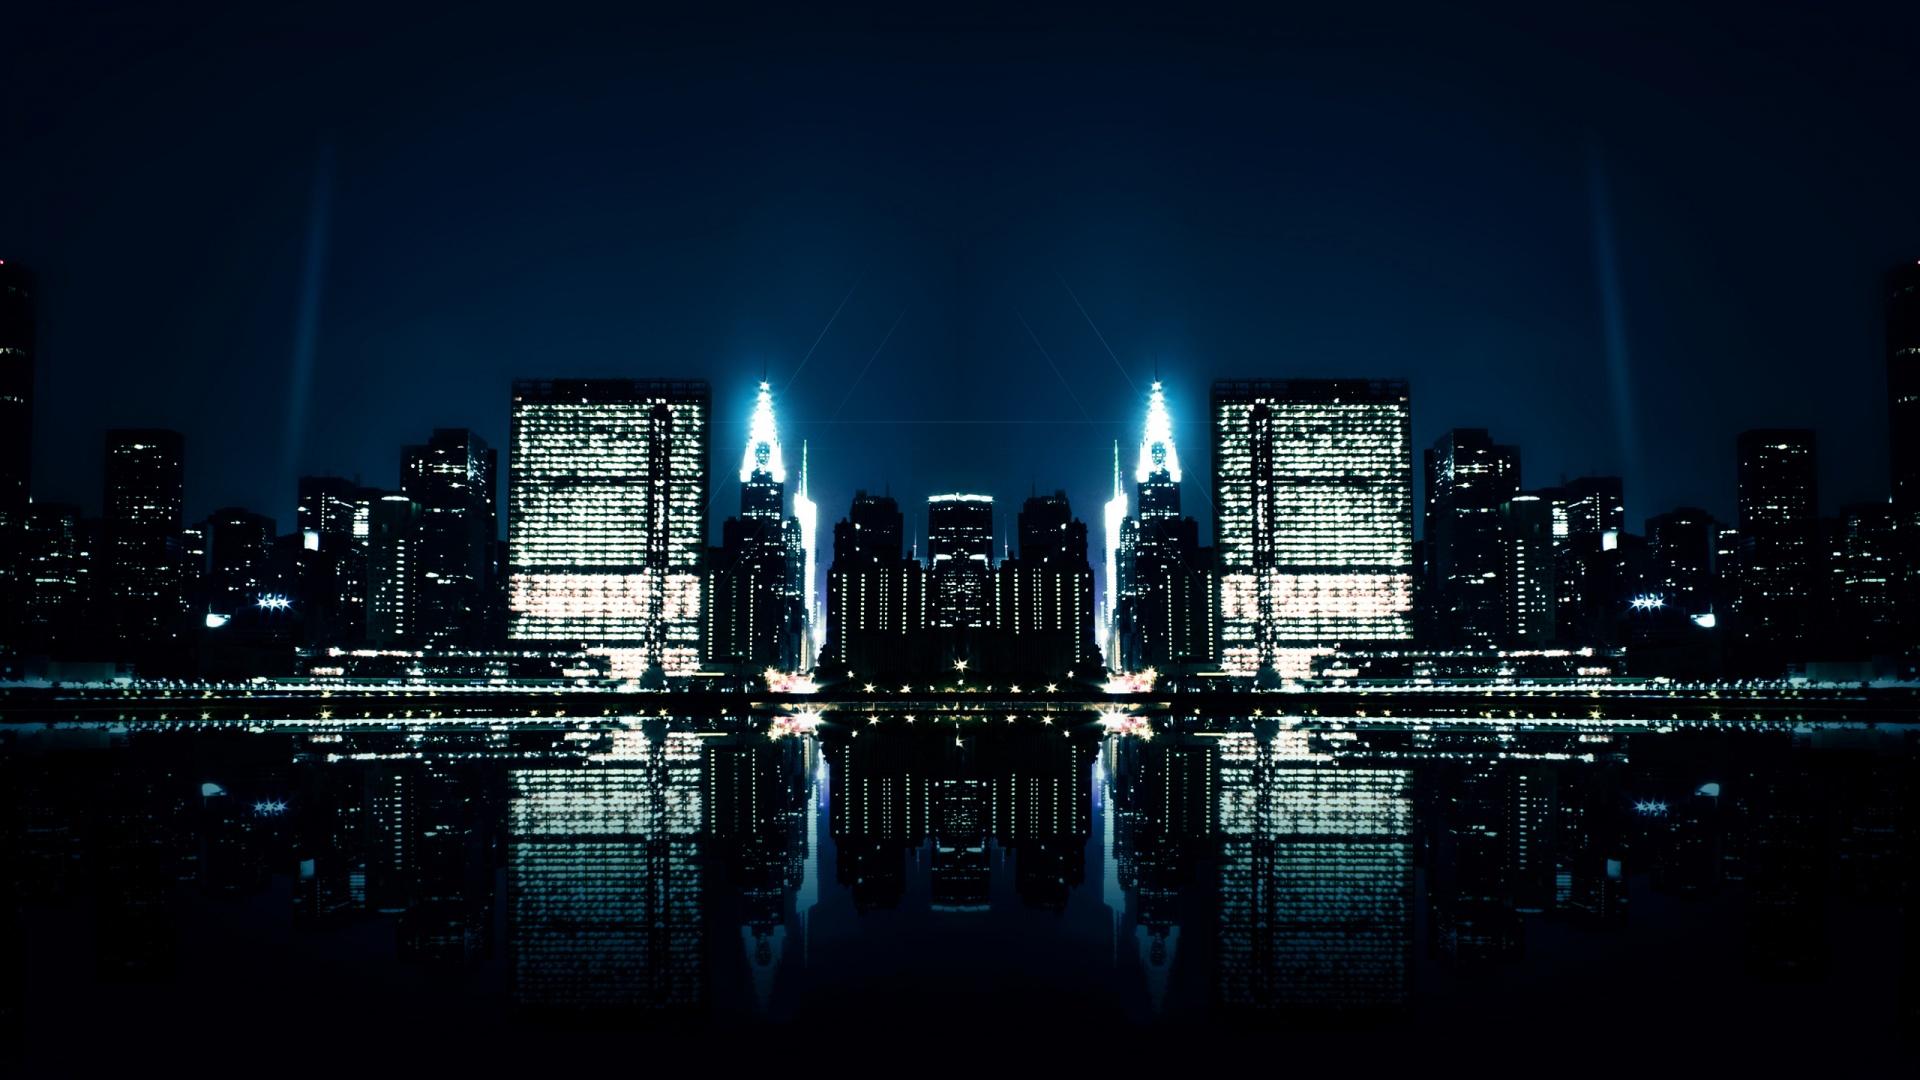 City Night Reflections Wallpaper HD Wallpupcom 1920x1080